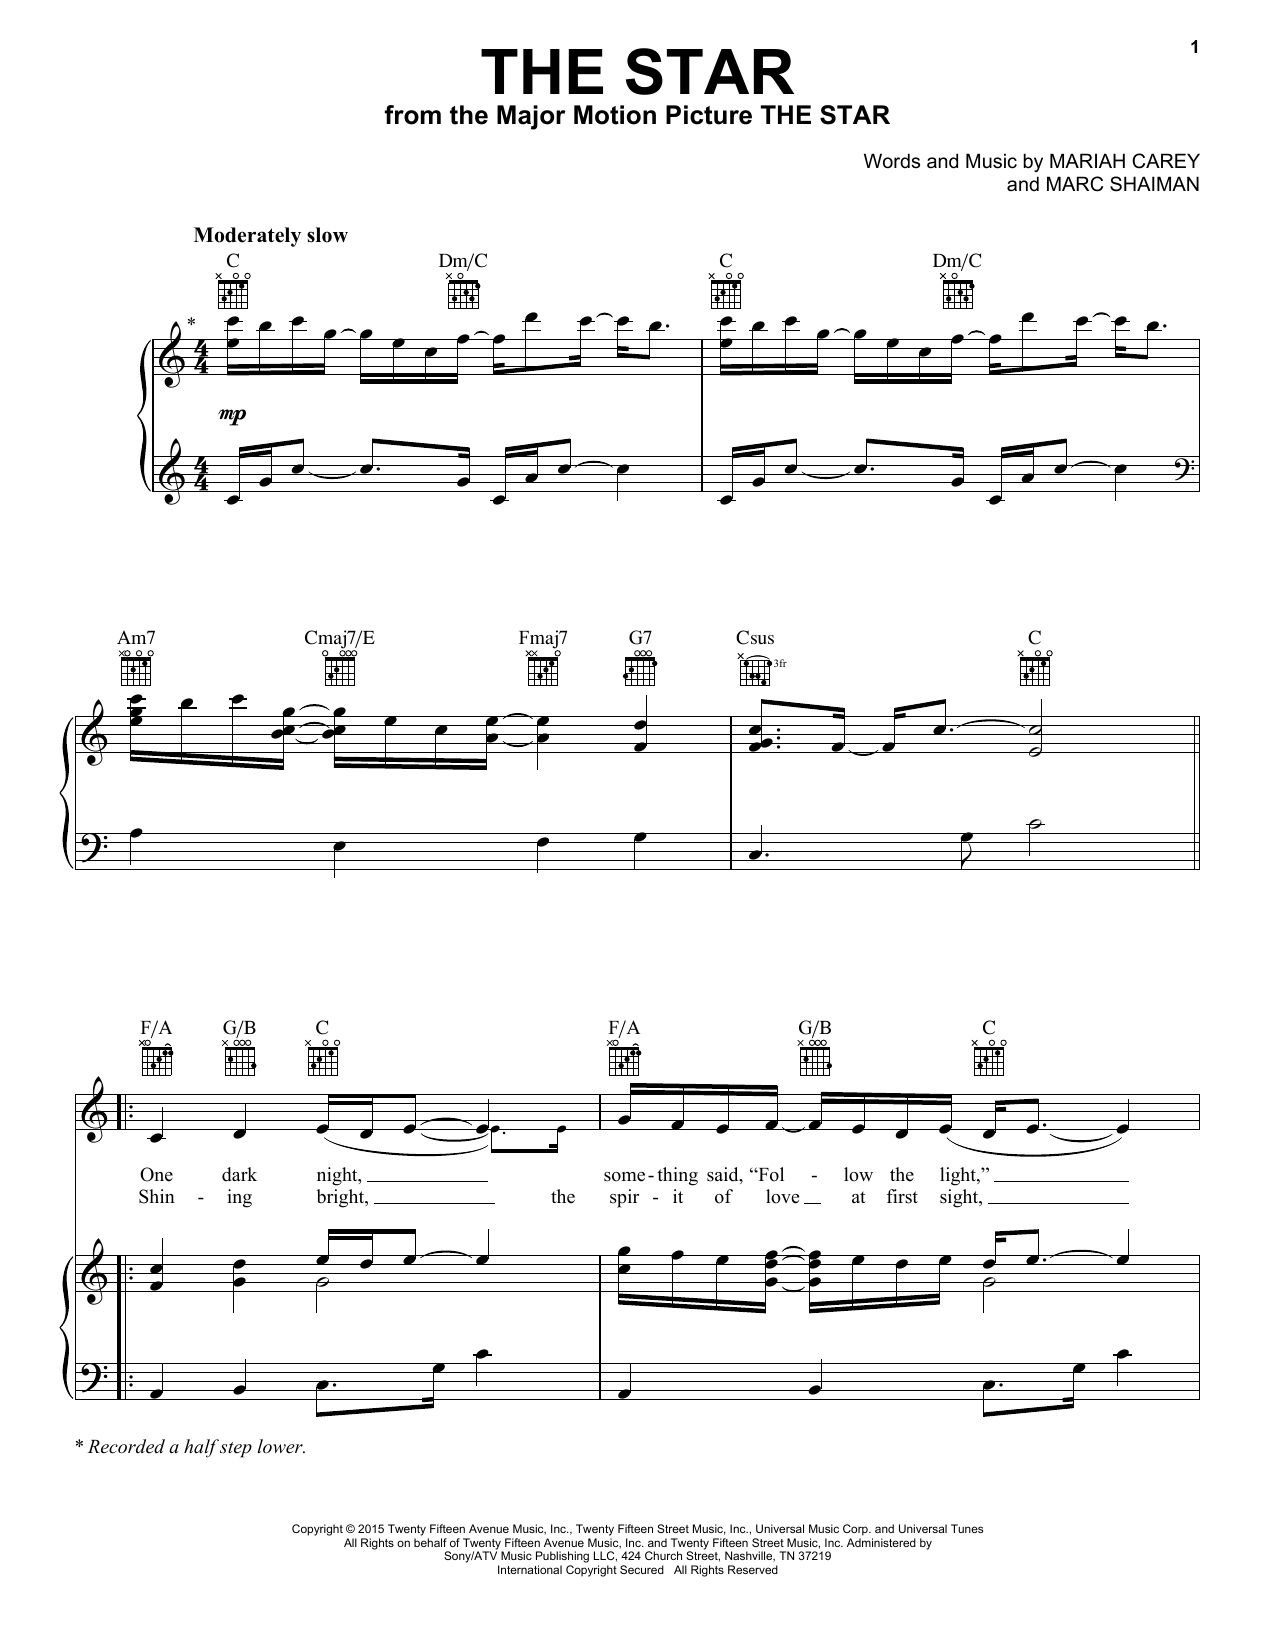 Mariah Carey The Star sheet music notes and chords